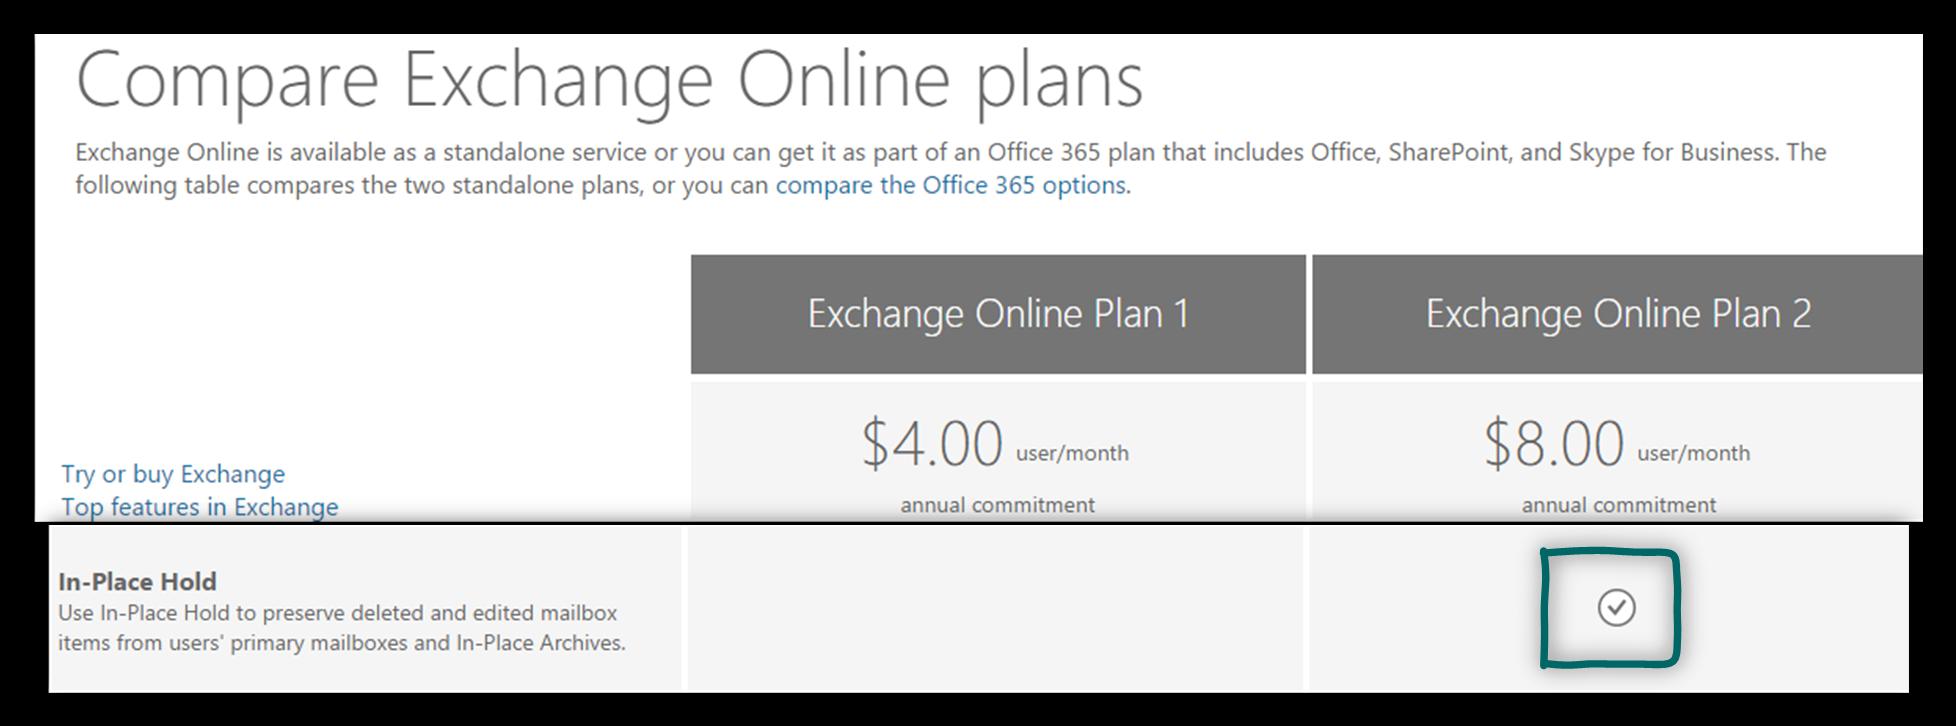 Compare Exchange Online plans